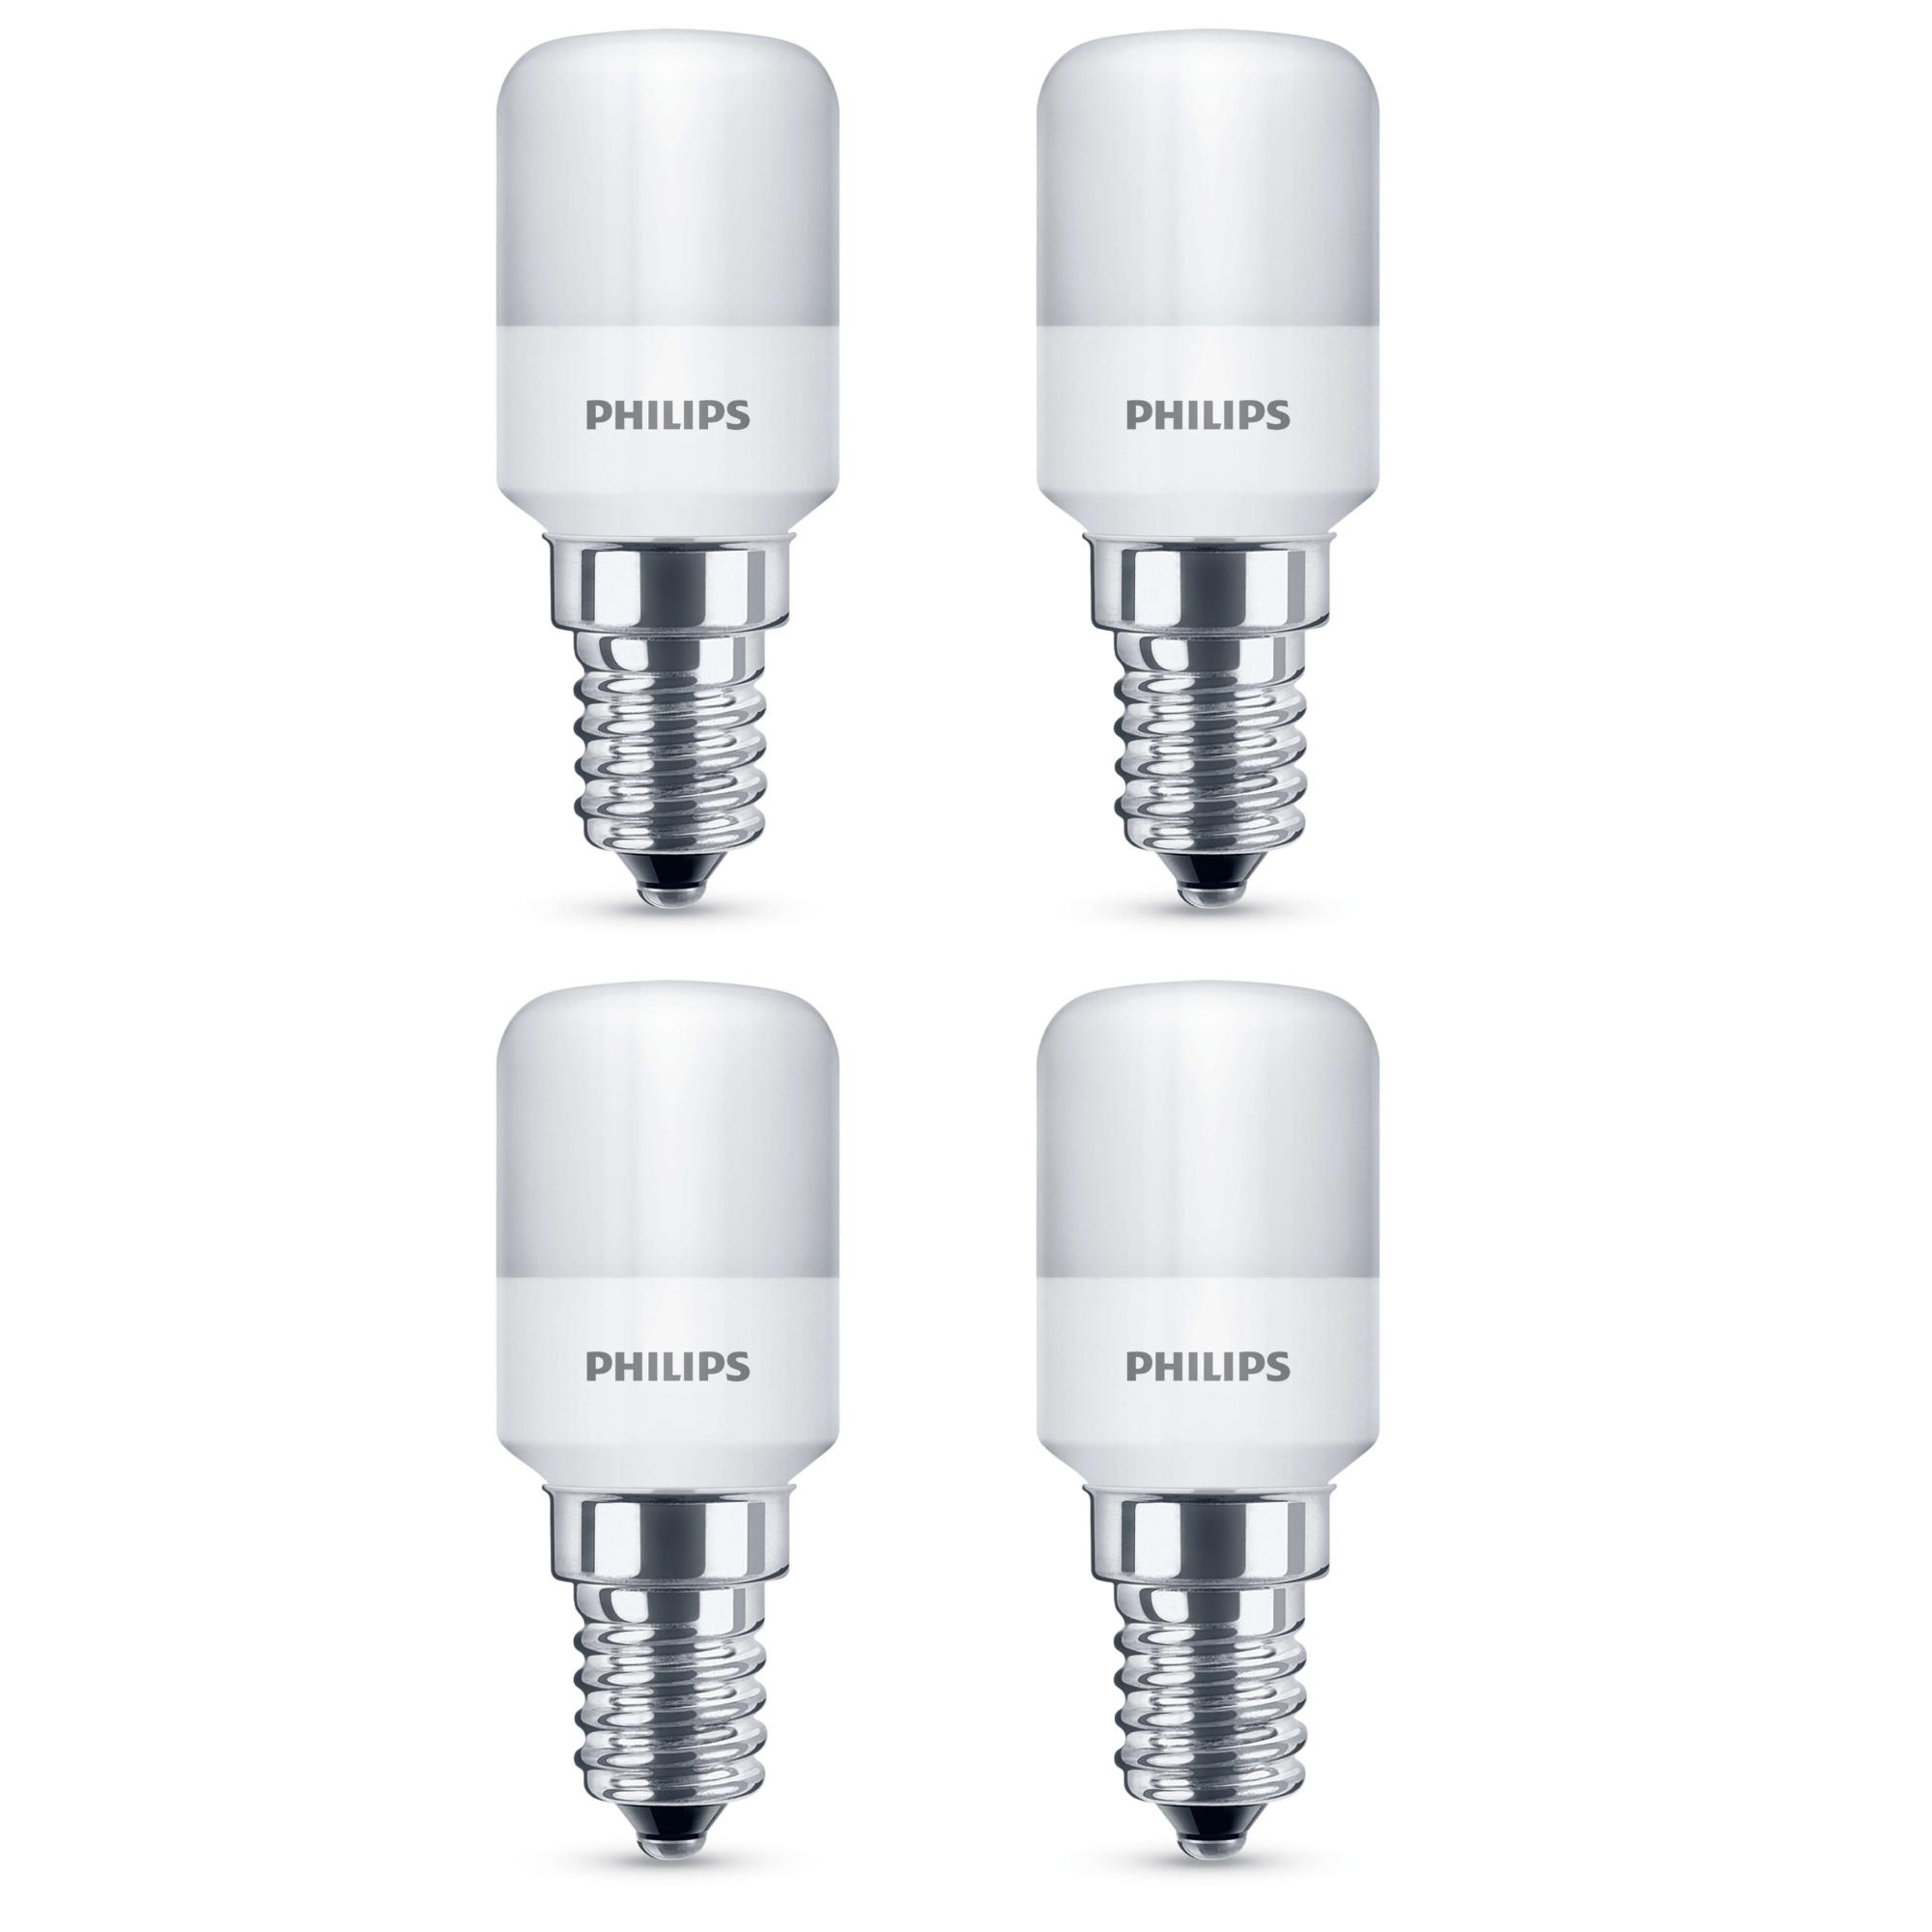 bulb daylight philips watt led light lumen resource lighting pack itm replacement